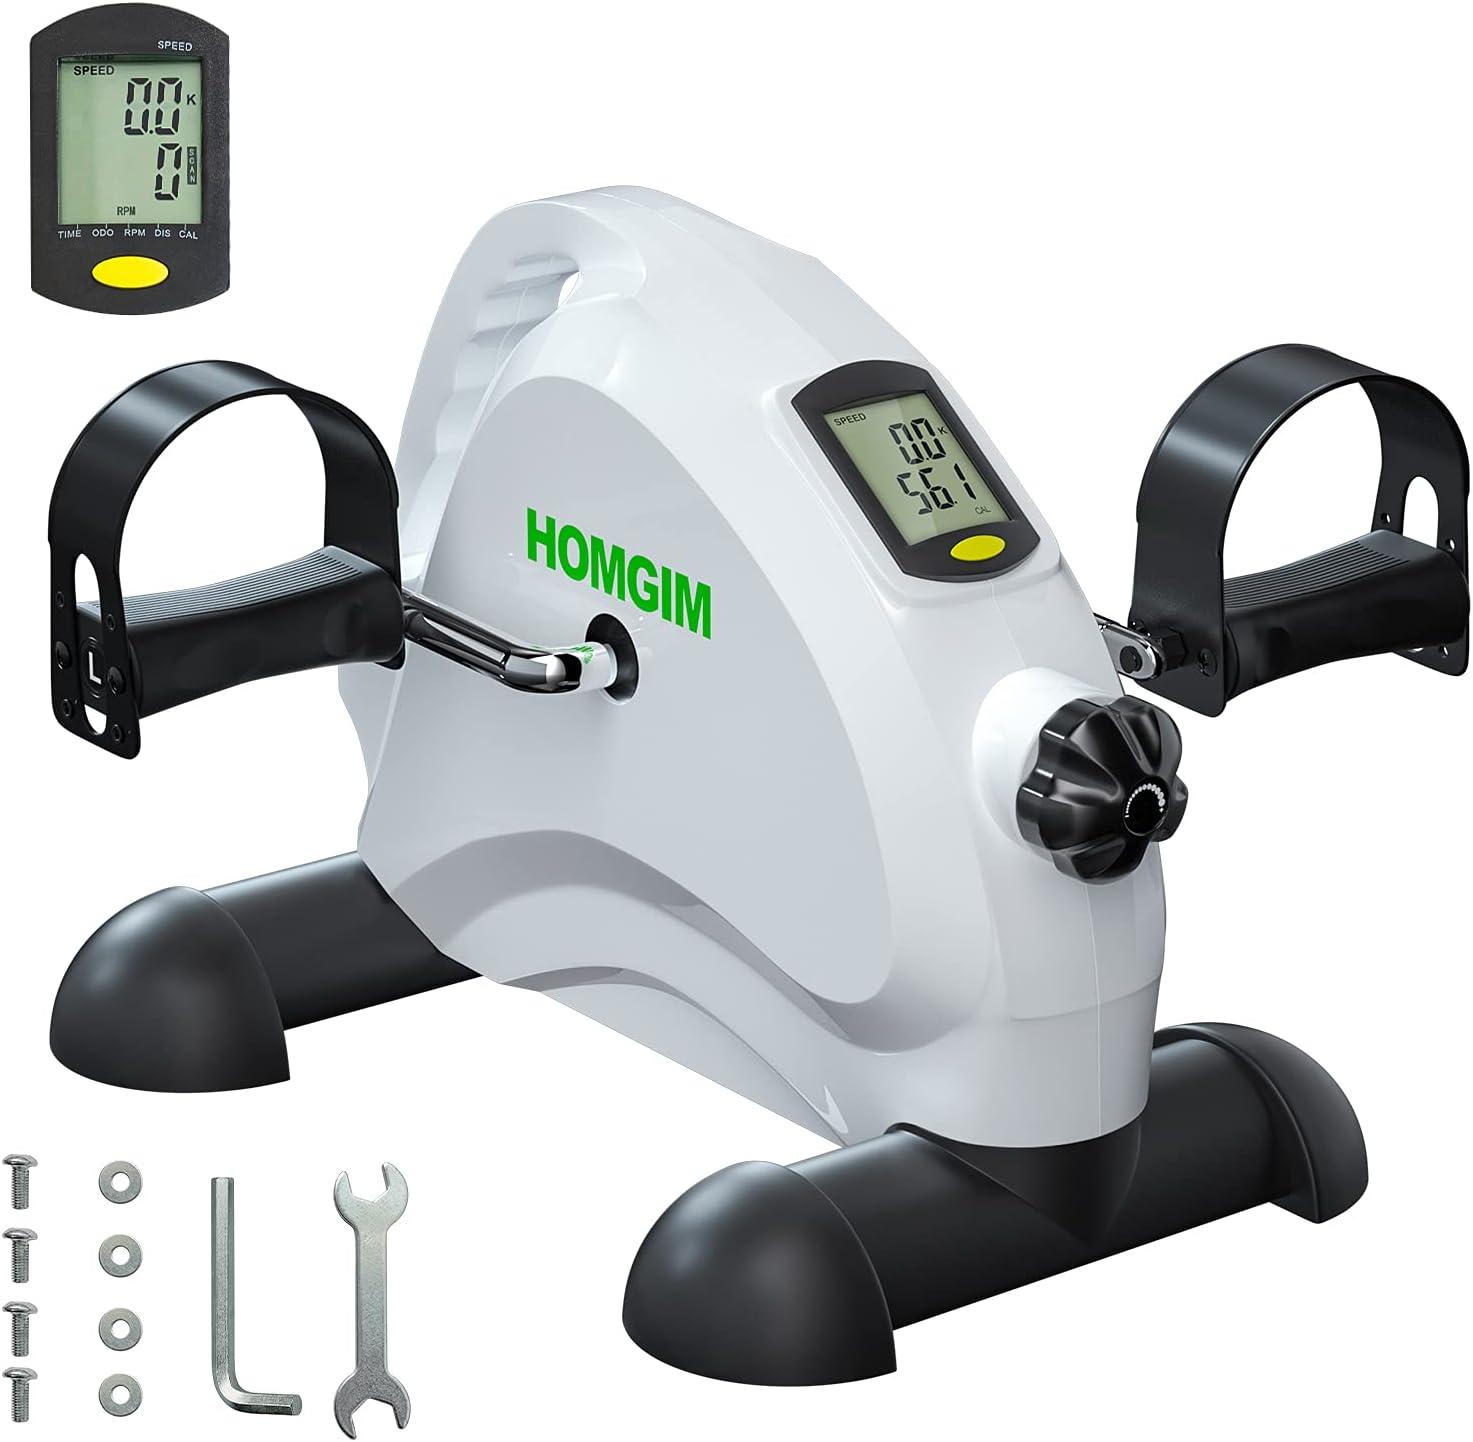 HOMGIM Under Desk Bike 高級品 Pedal Mini Low 海外輸入 Exerciser Smooth Noise